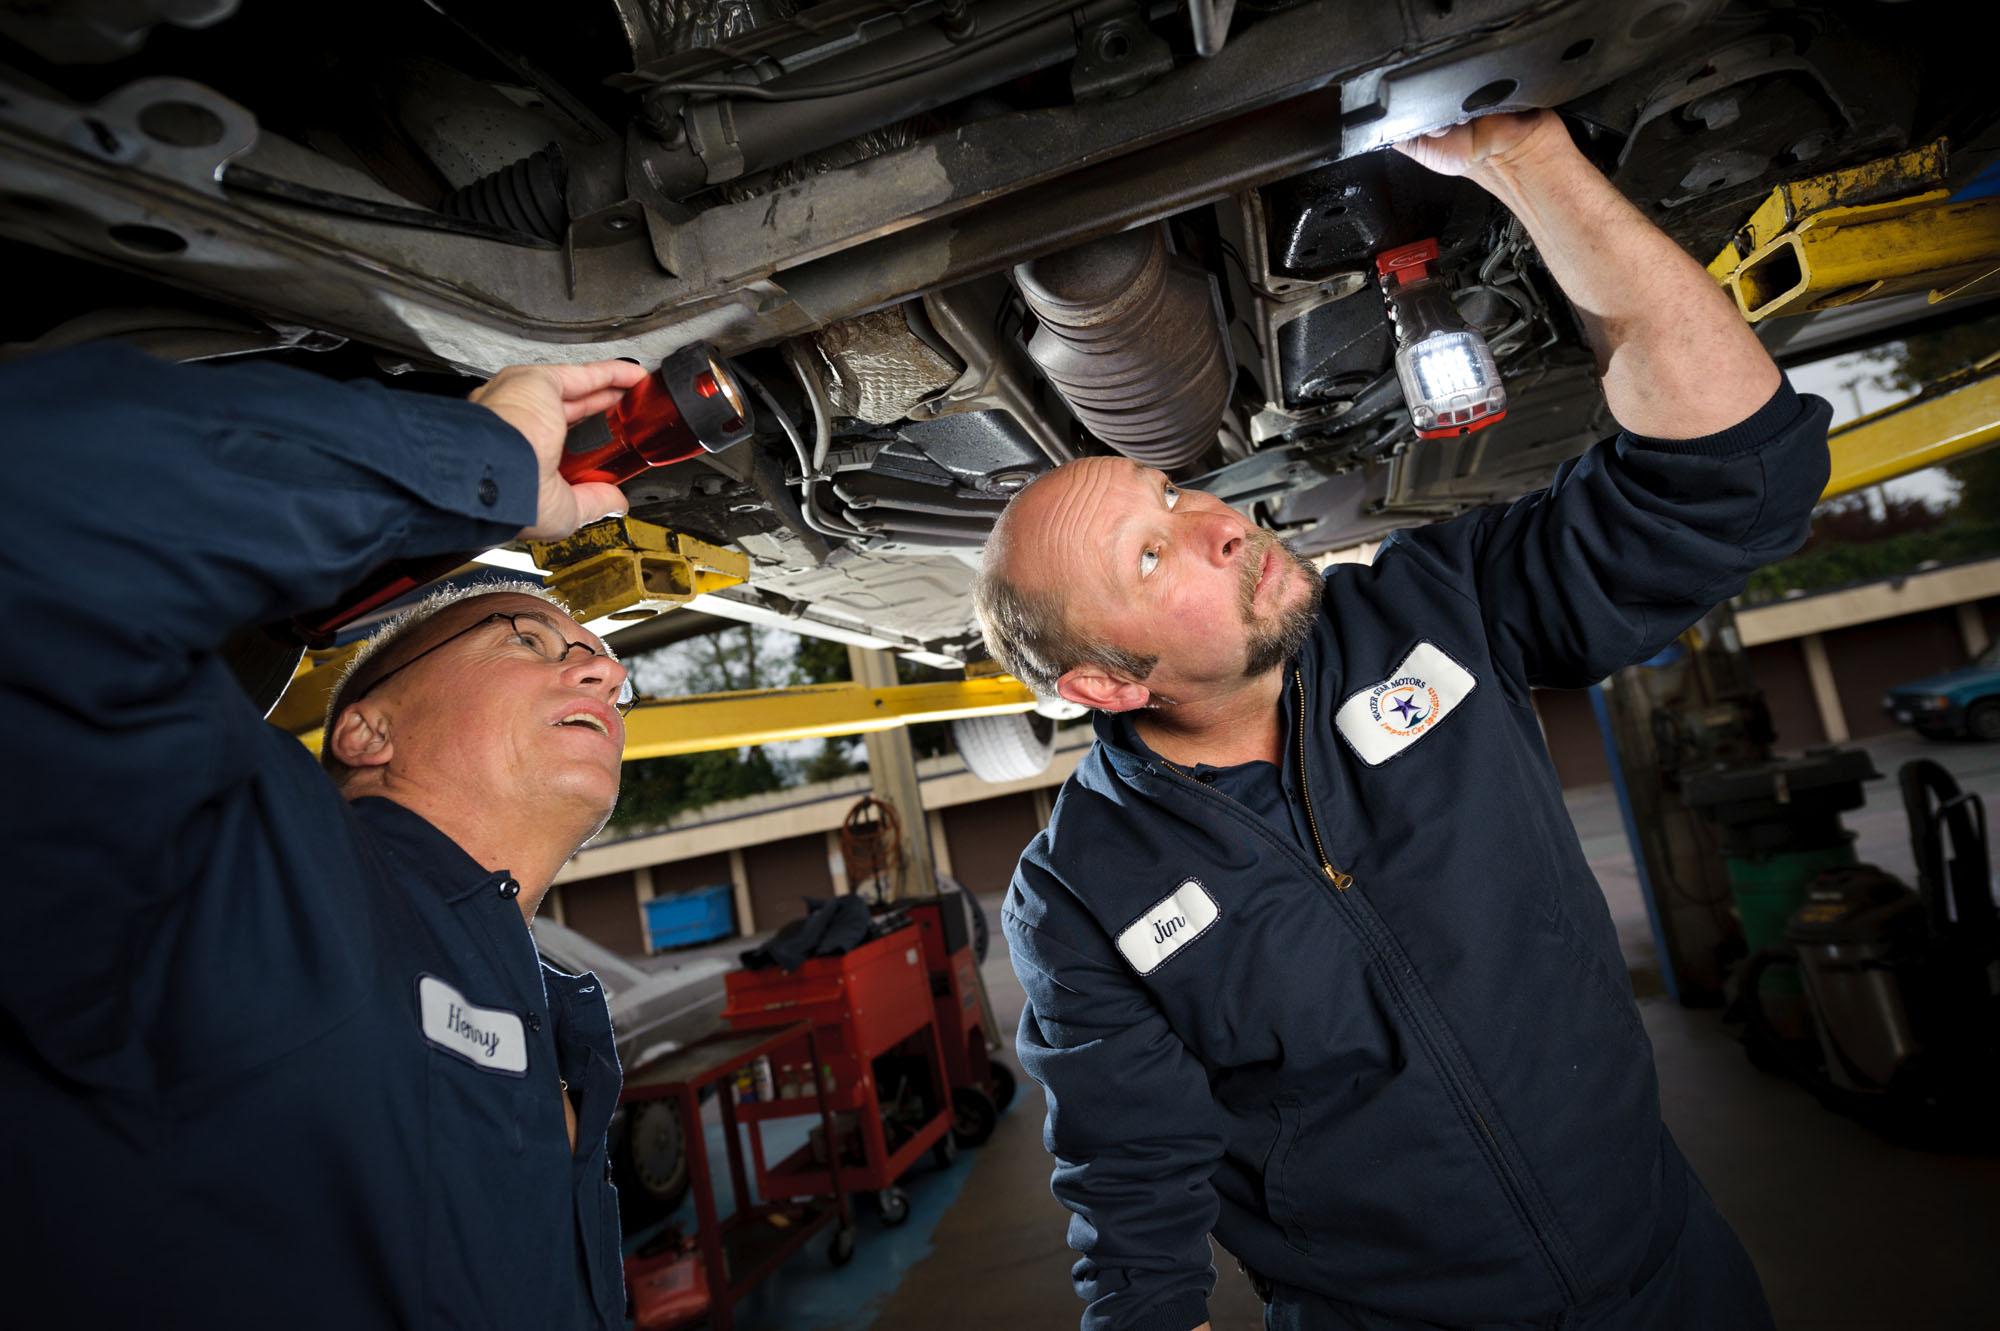 4392-d700_Waterstar_Motors_Santa_Cruz_Commercial_Garage_Photography.jpg